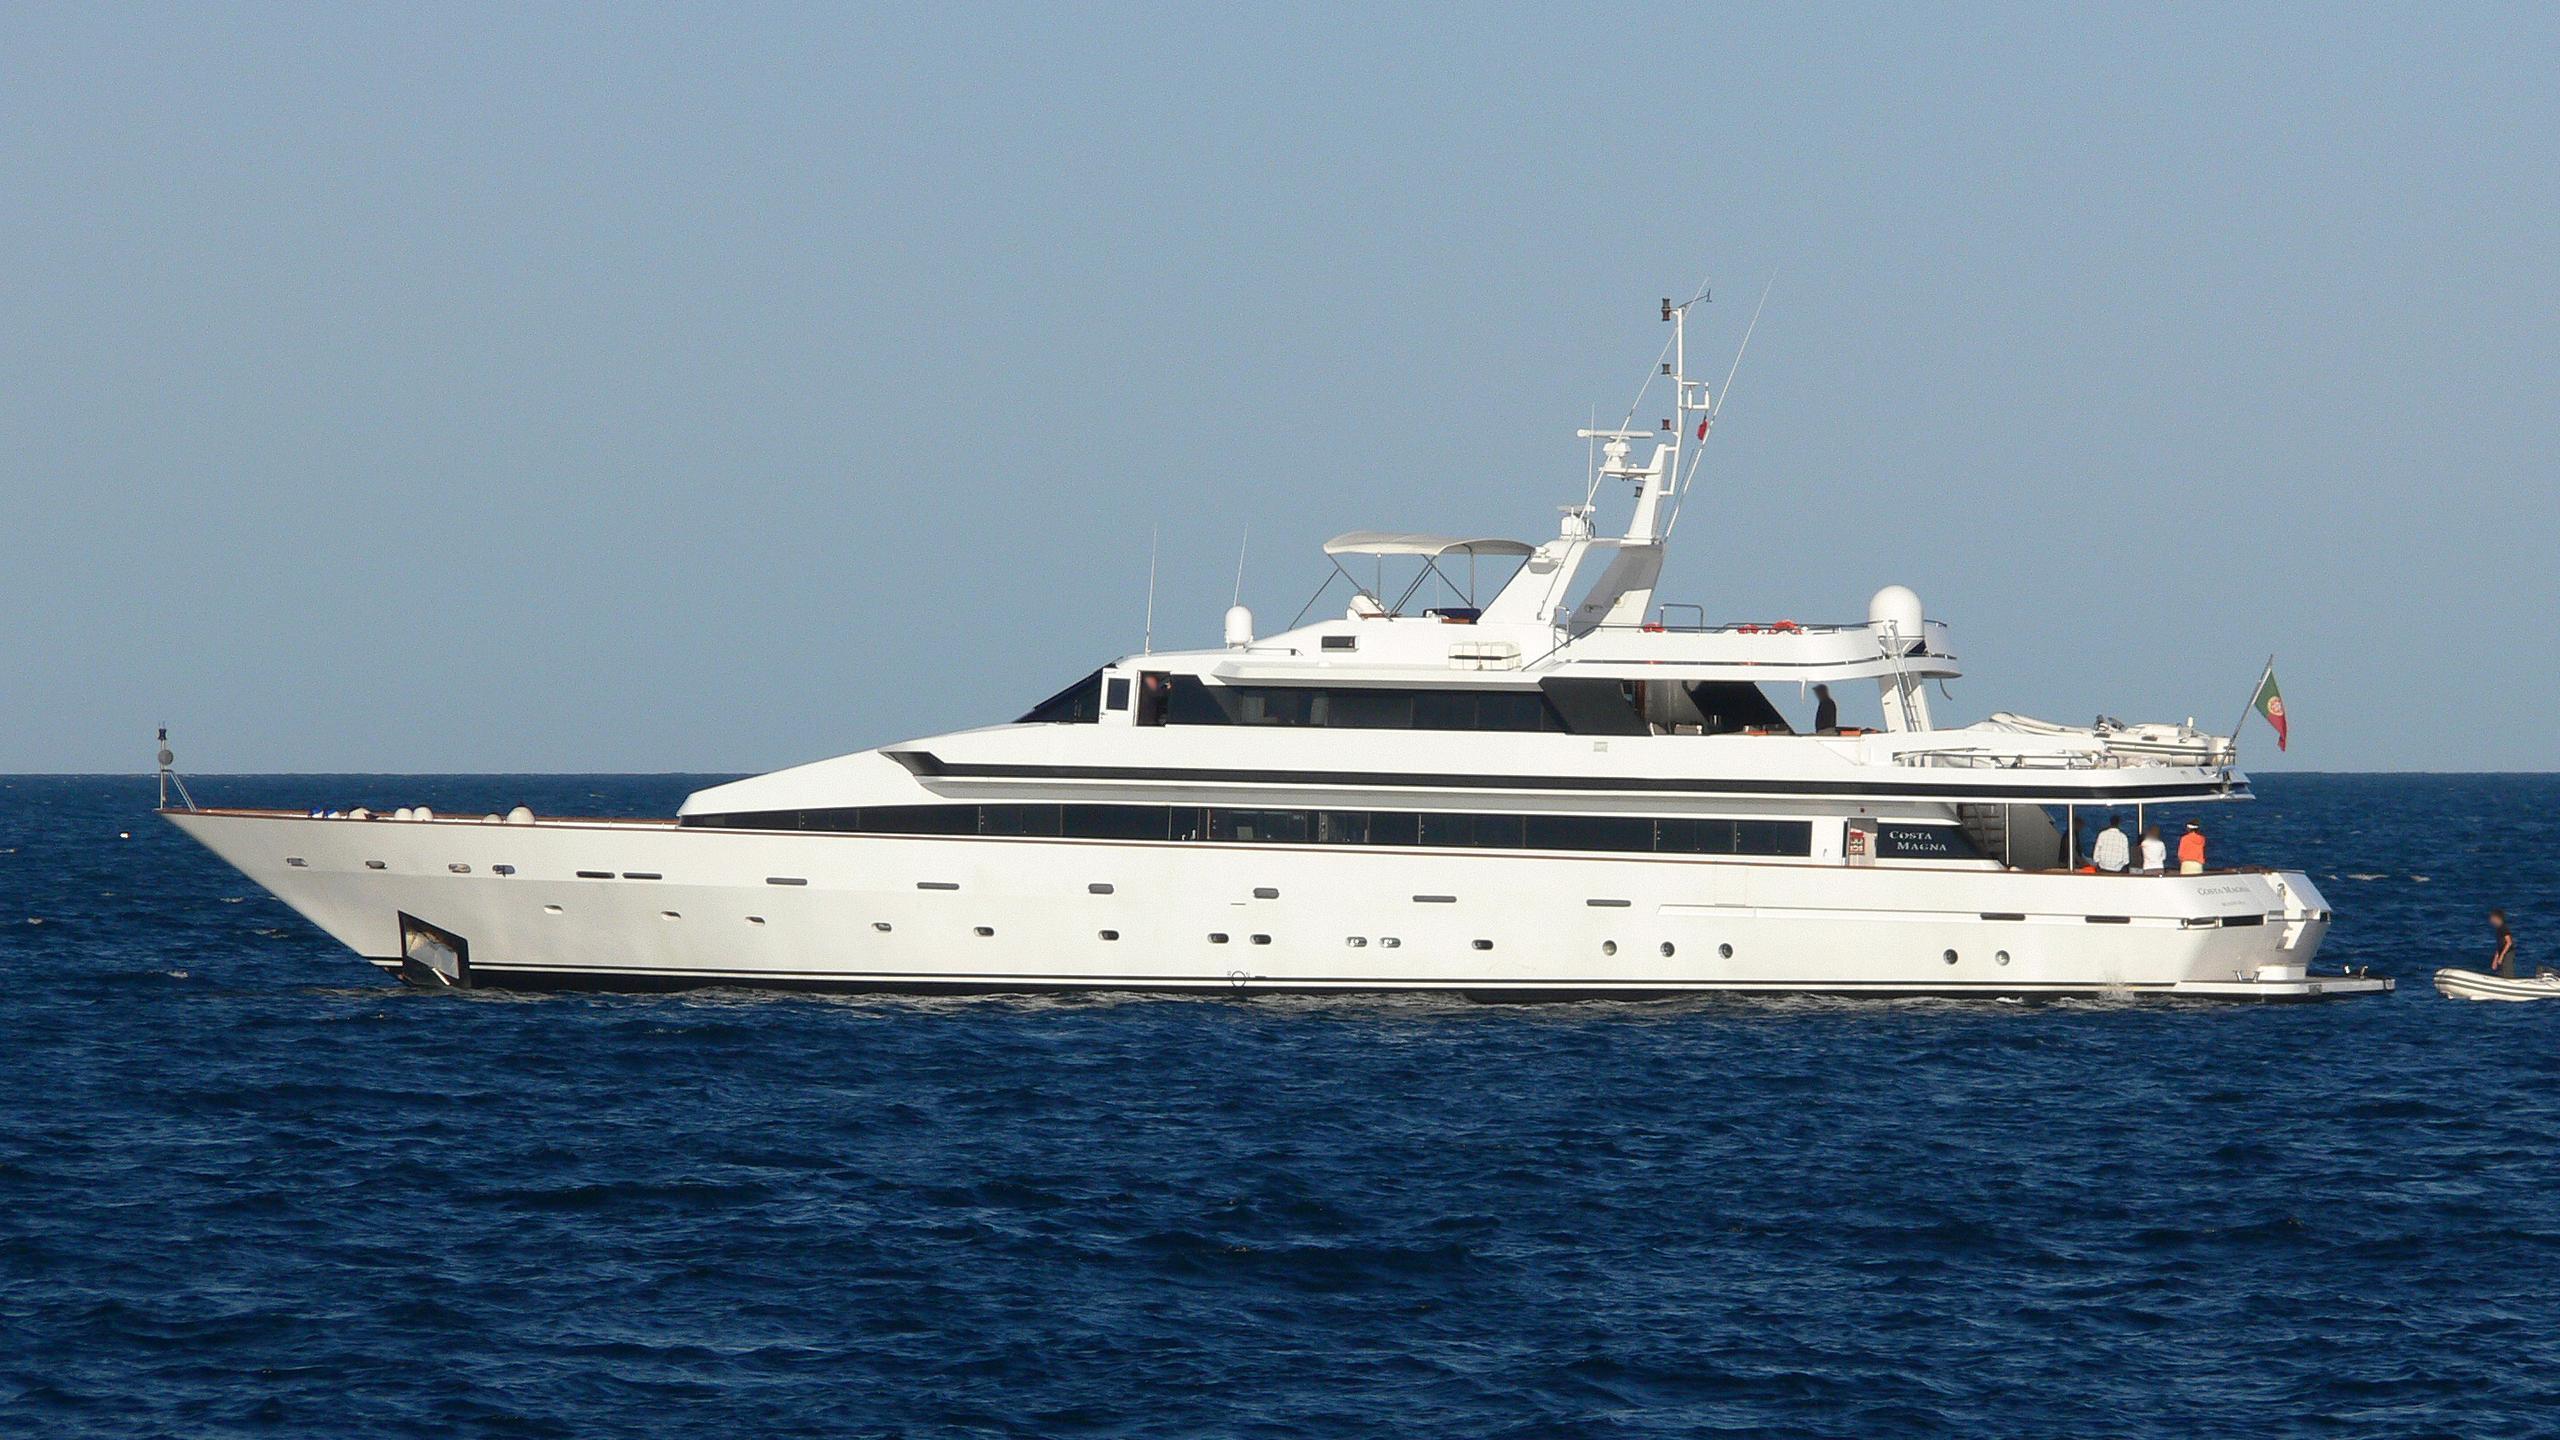 costa-magna-motor-yacht-proteksan-1986-44m-profile